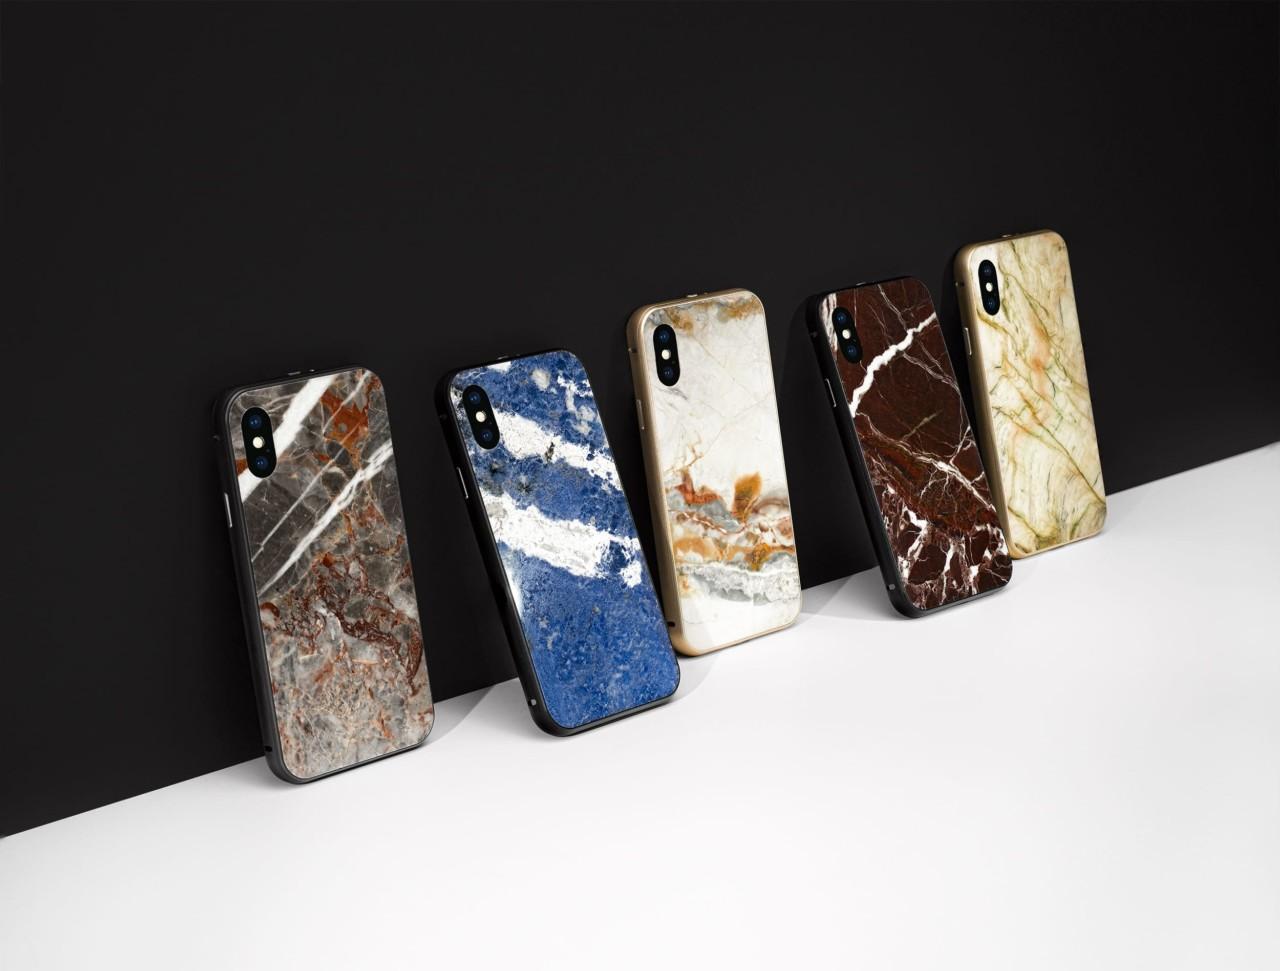 Roxxlyn Encases Your Precious iPhone X in 350 Million Year Old Rock